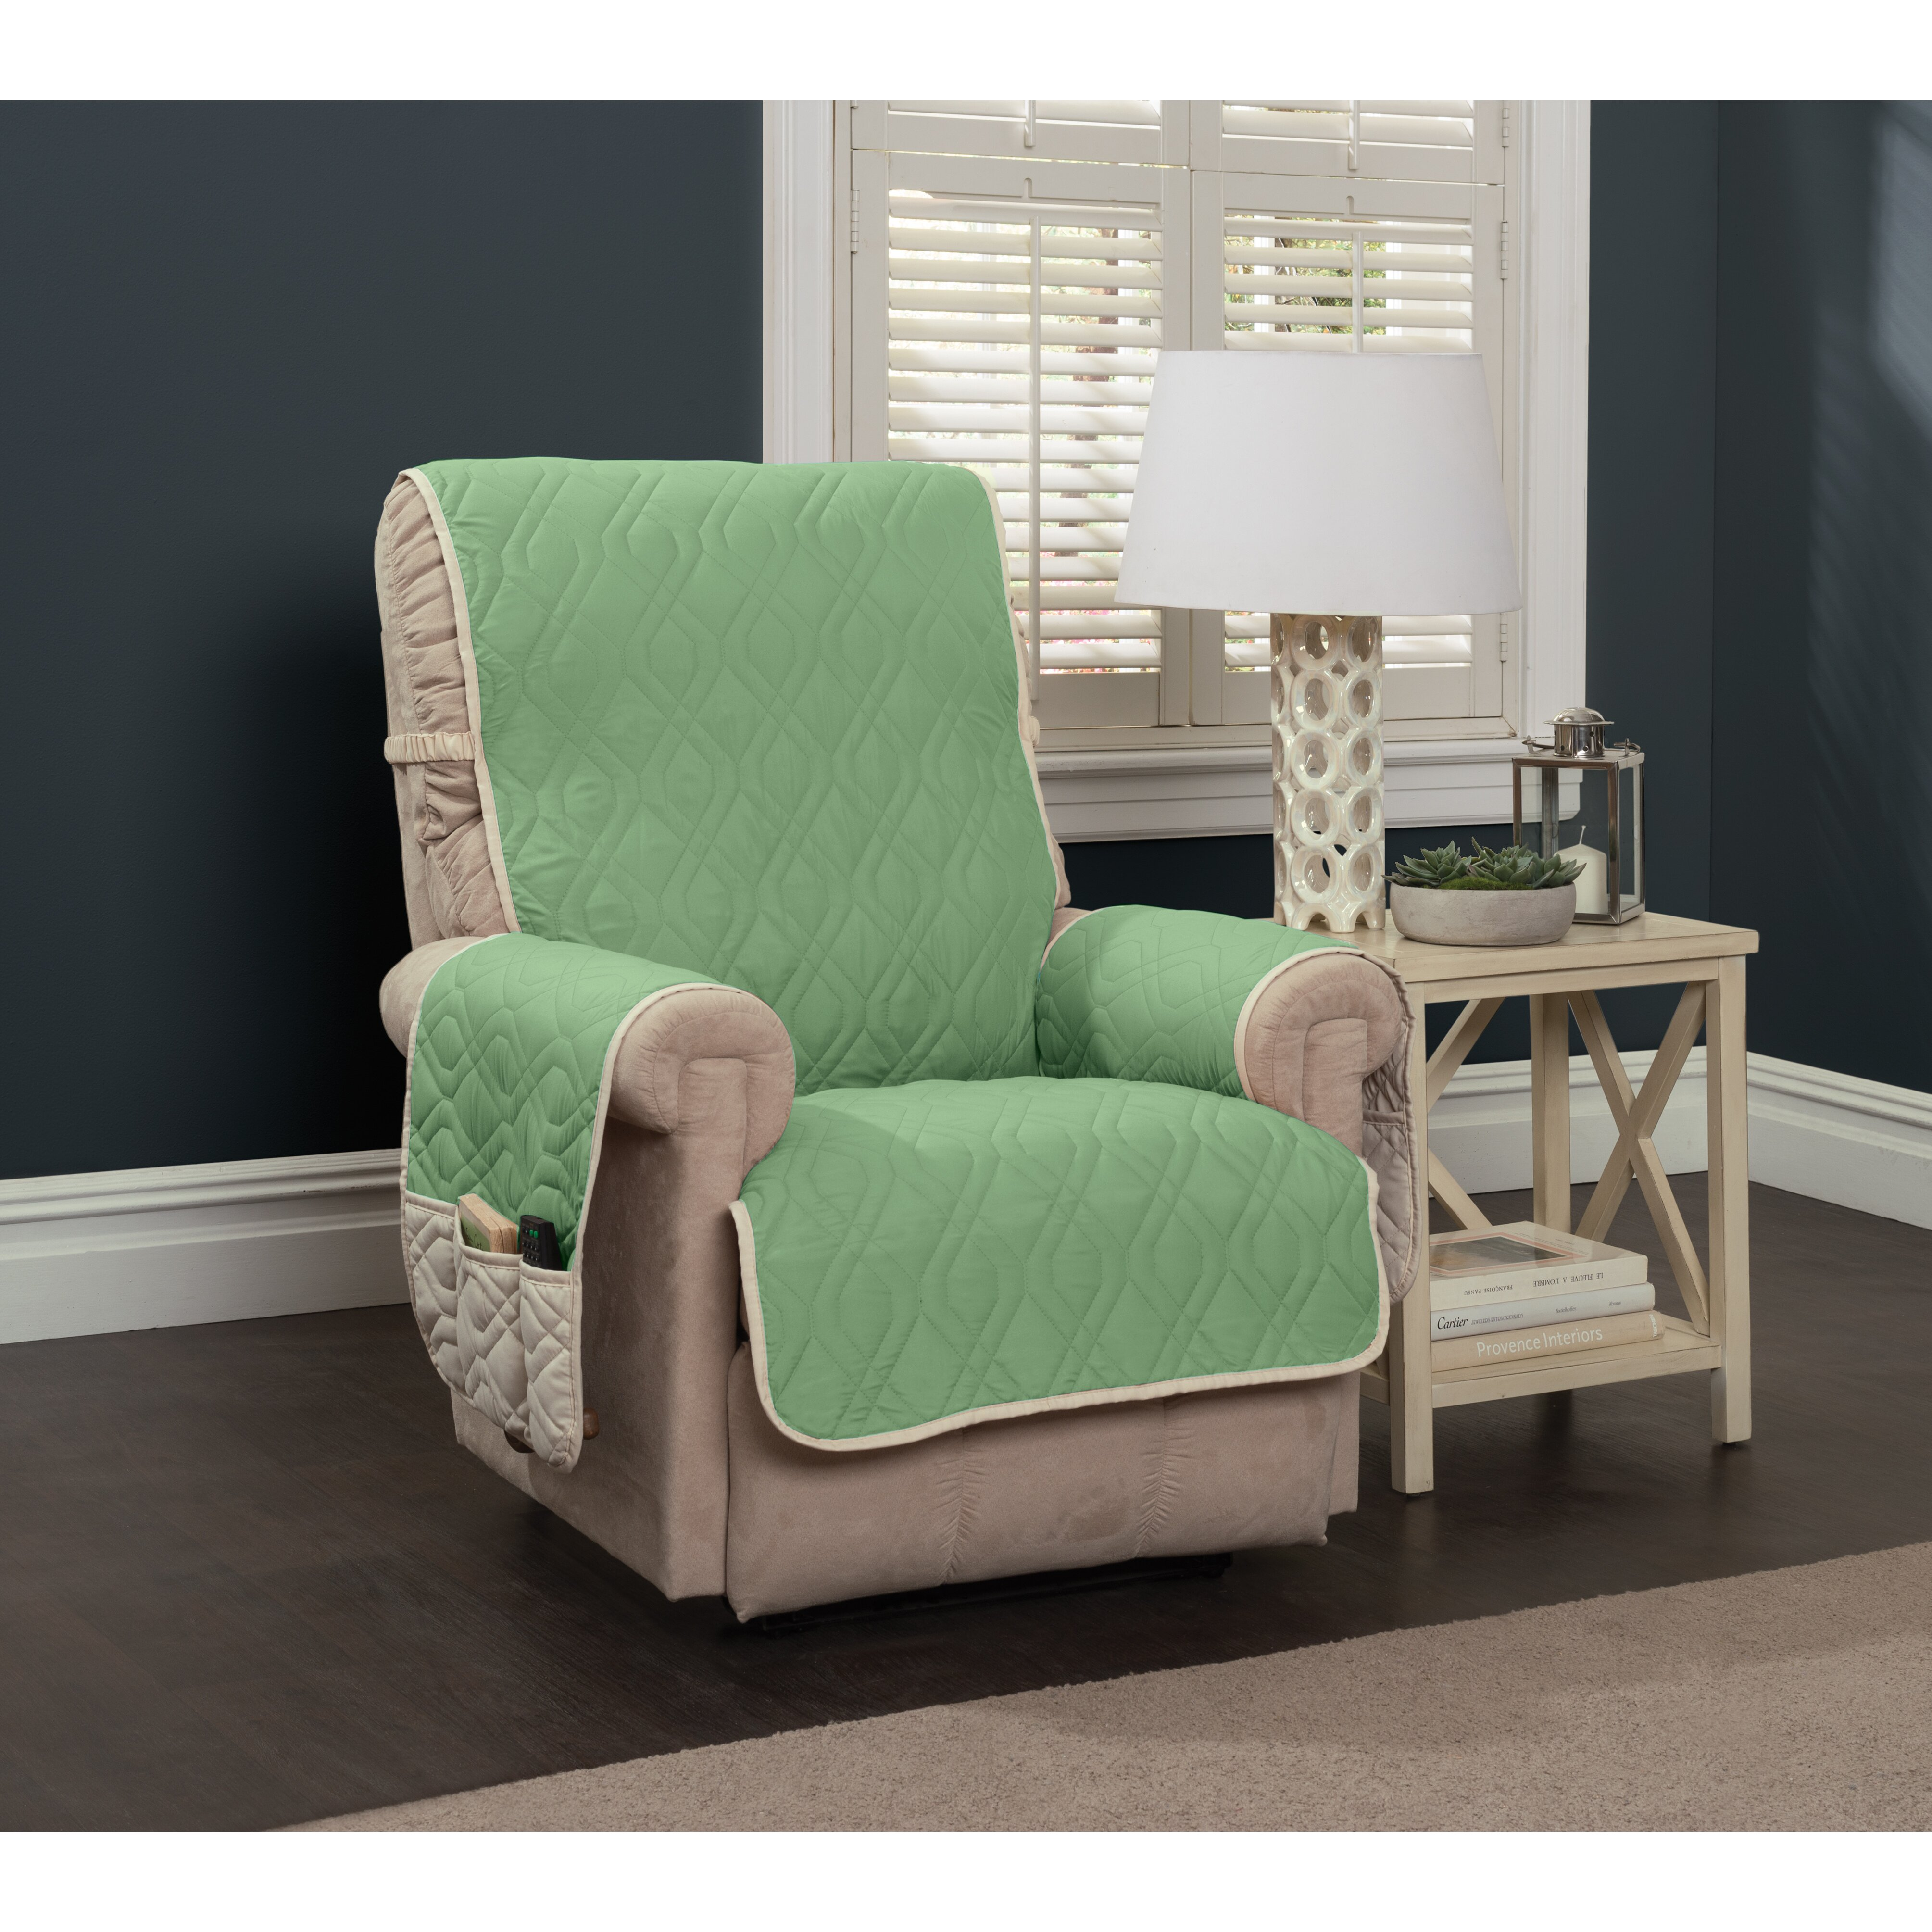 5 Star Furniture Kpoplagu